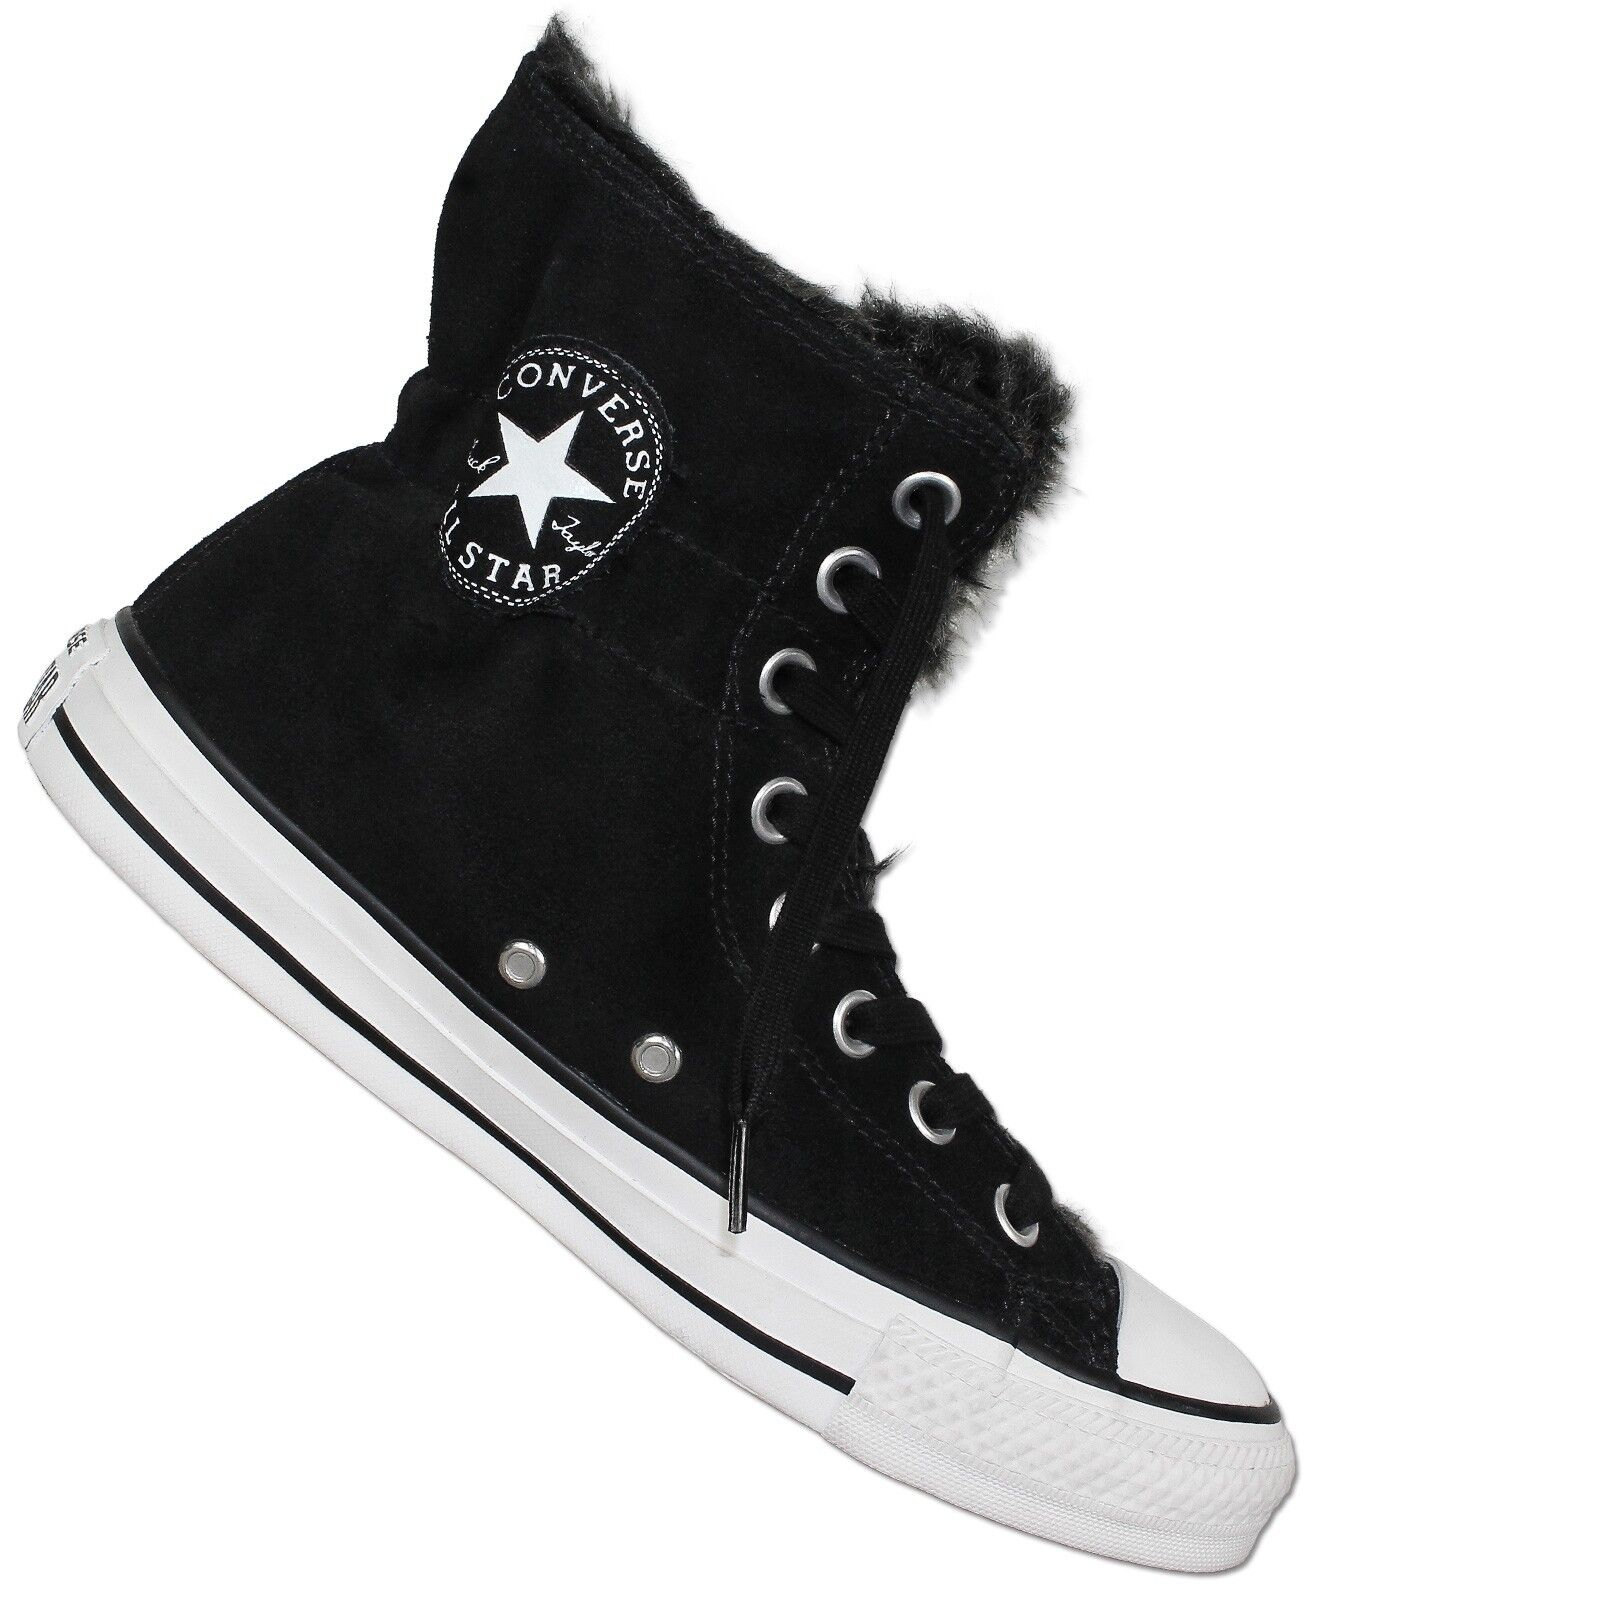 Converse all Star Chuck Taylor Ct Clr Scrunch Hi Black Winter shoes Padded